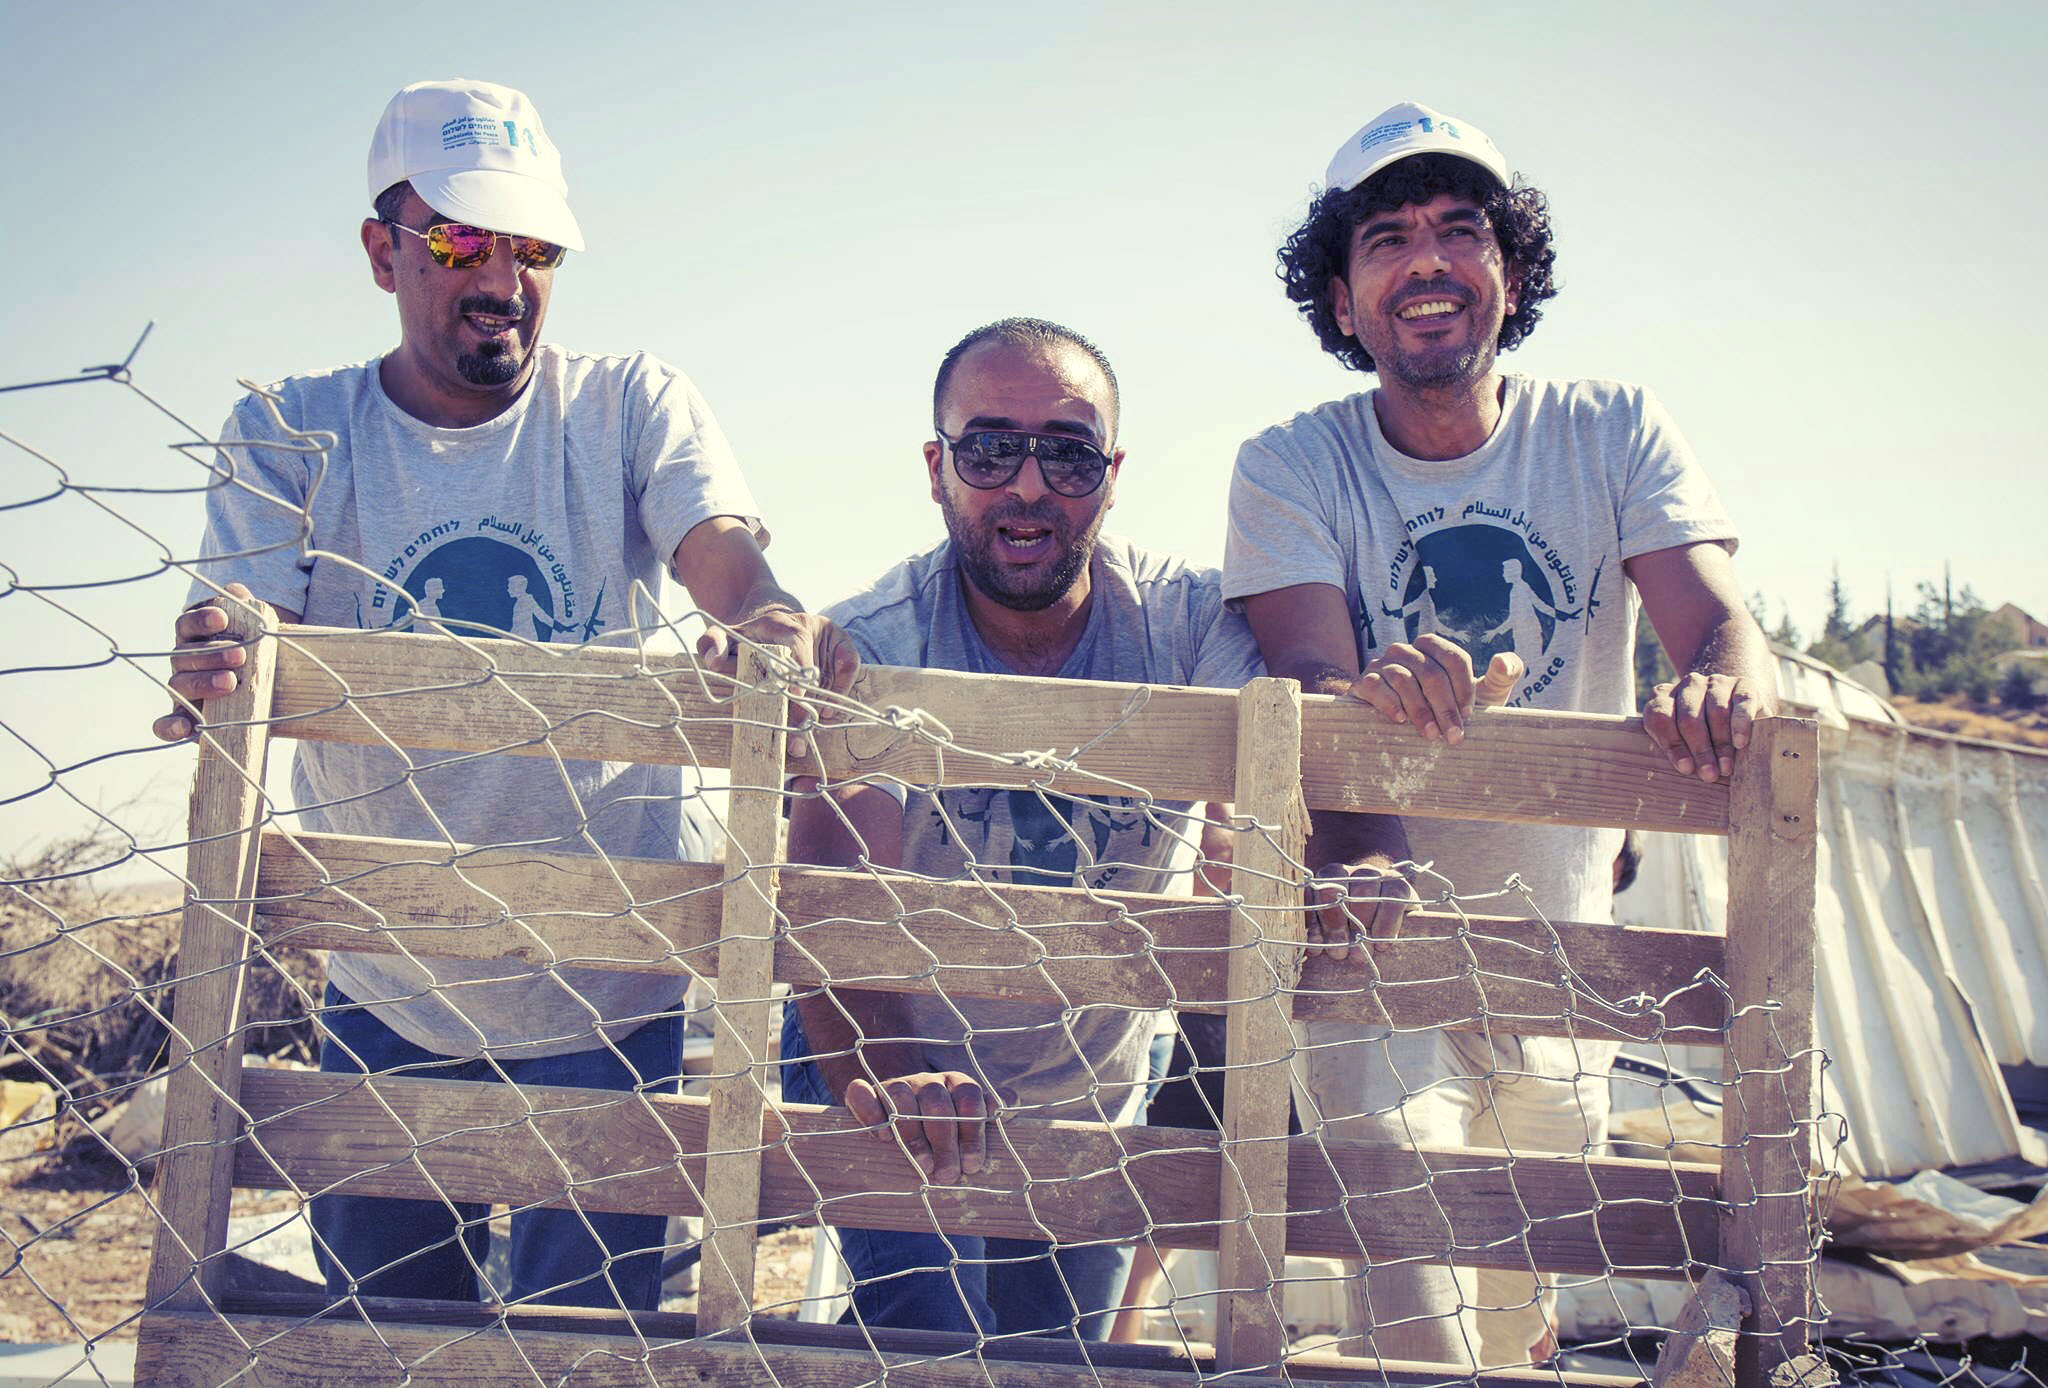 Combatants for Peace activist Sulaiman al-Khatib (far right) helps rebuild after demolitions in Umm el-Khair, near Hebron. (Photo/Tatyana Gitlits)